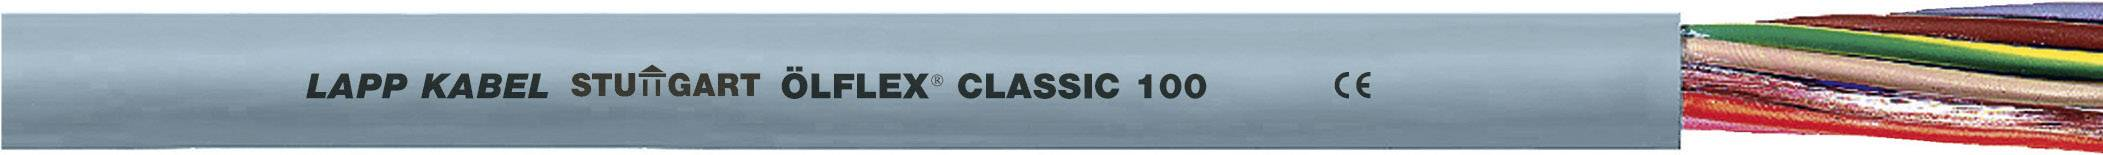 Kabel LappKabel Ölflex CLASSIC 100 12G0,5 (0010008), PVC, 8,9 mm, 500 V, šedá, 300 m